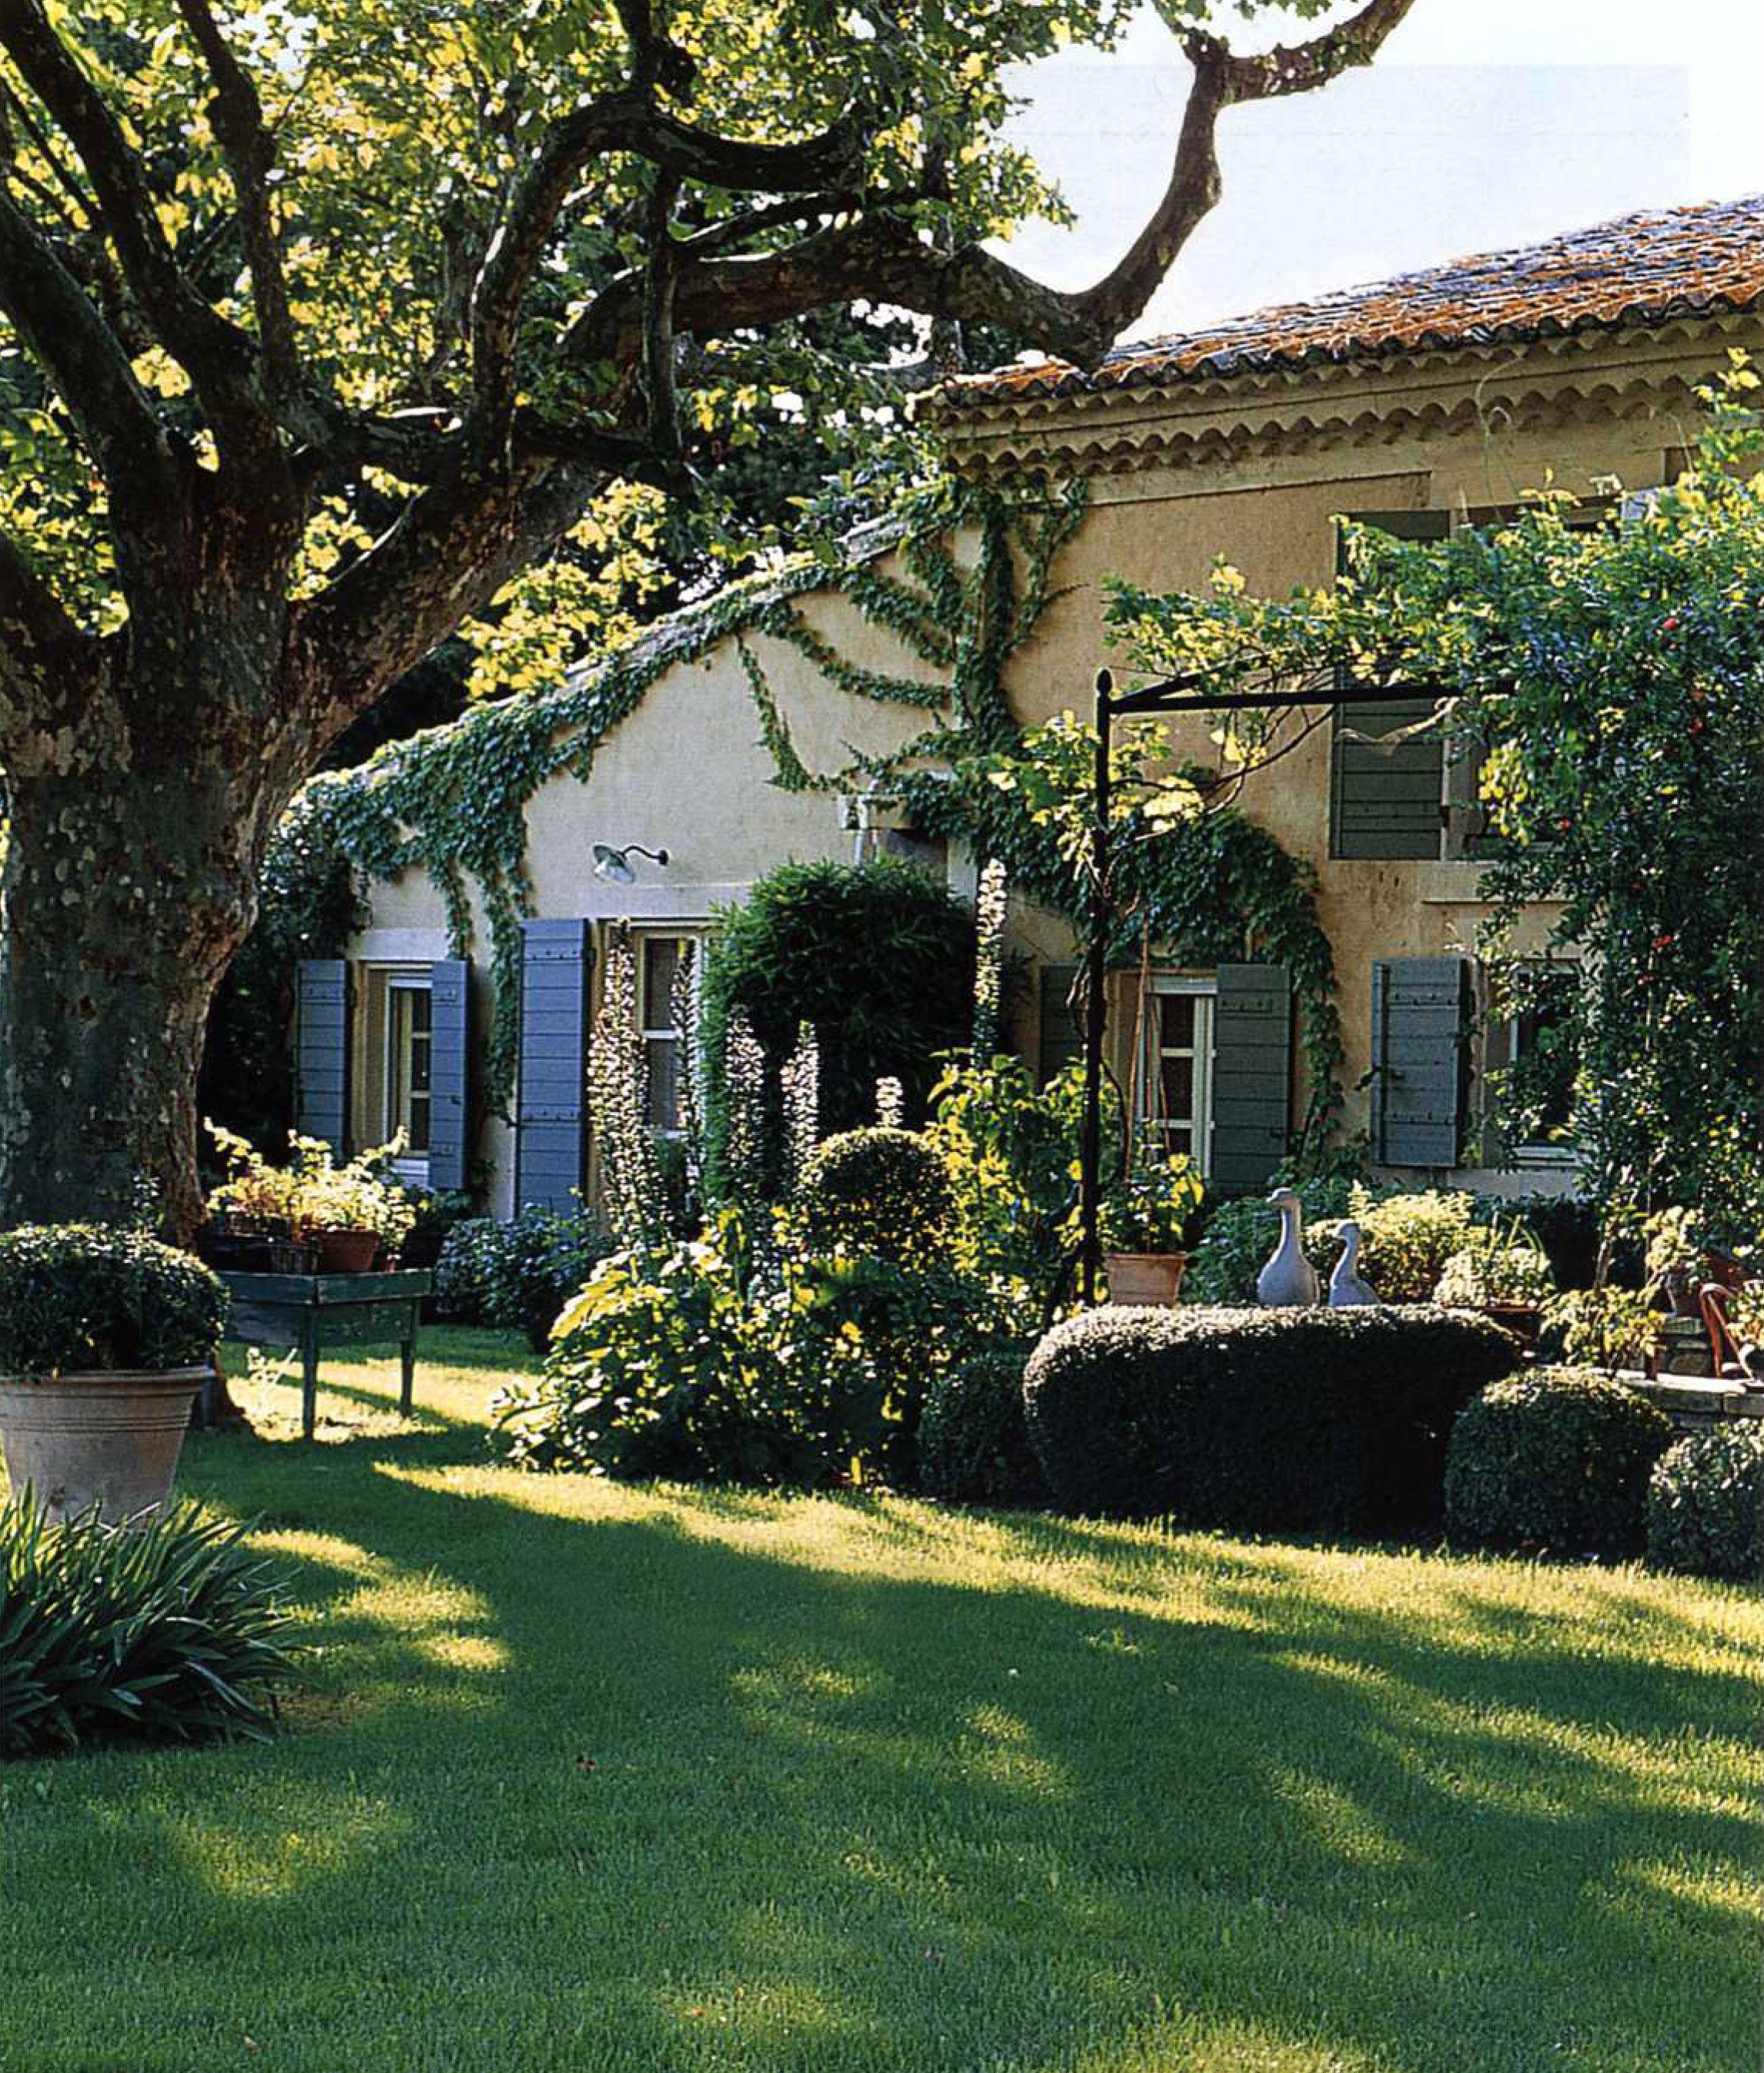 Her Garden In Provence (Avec Images) | Jardin Maison avec Jardin De Provence